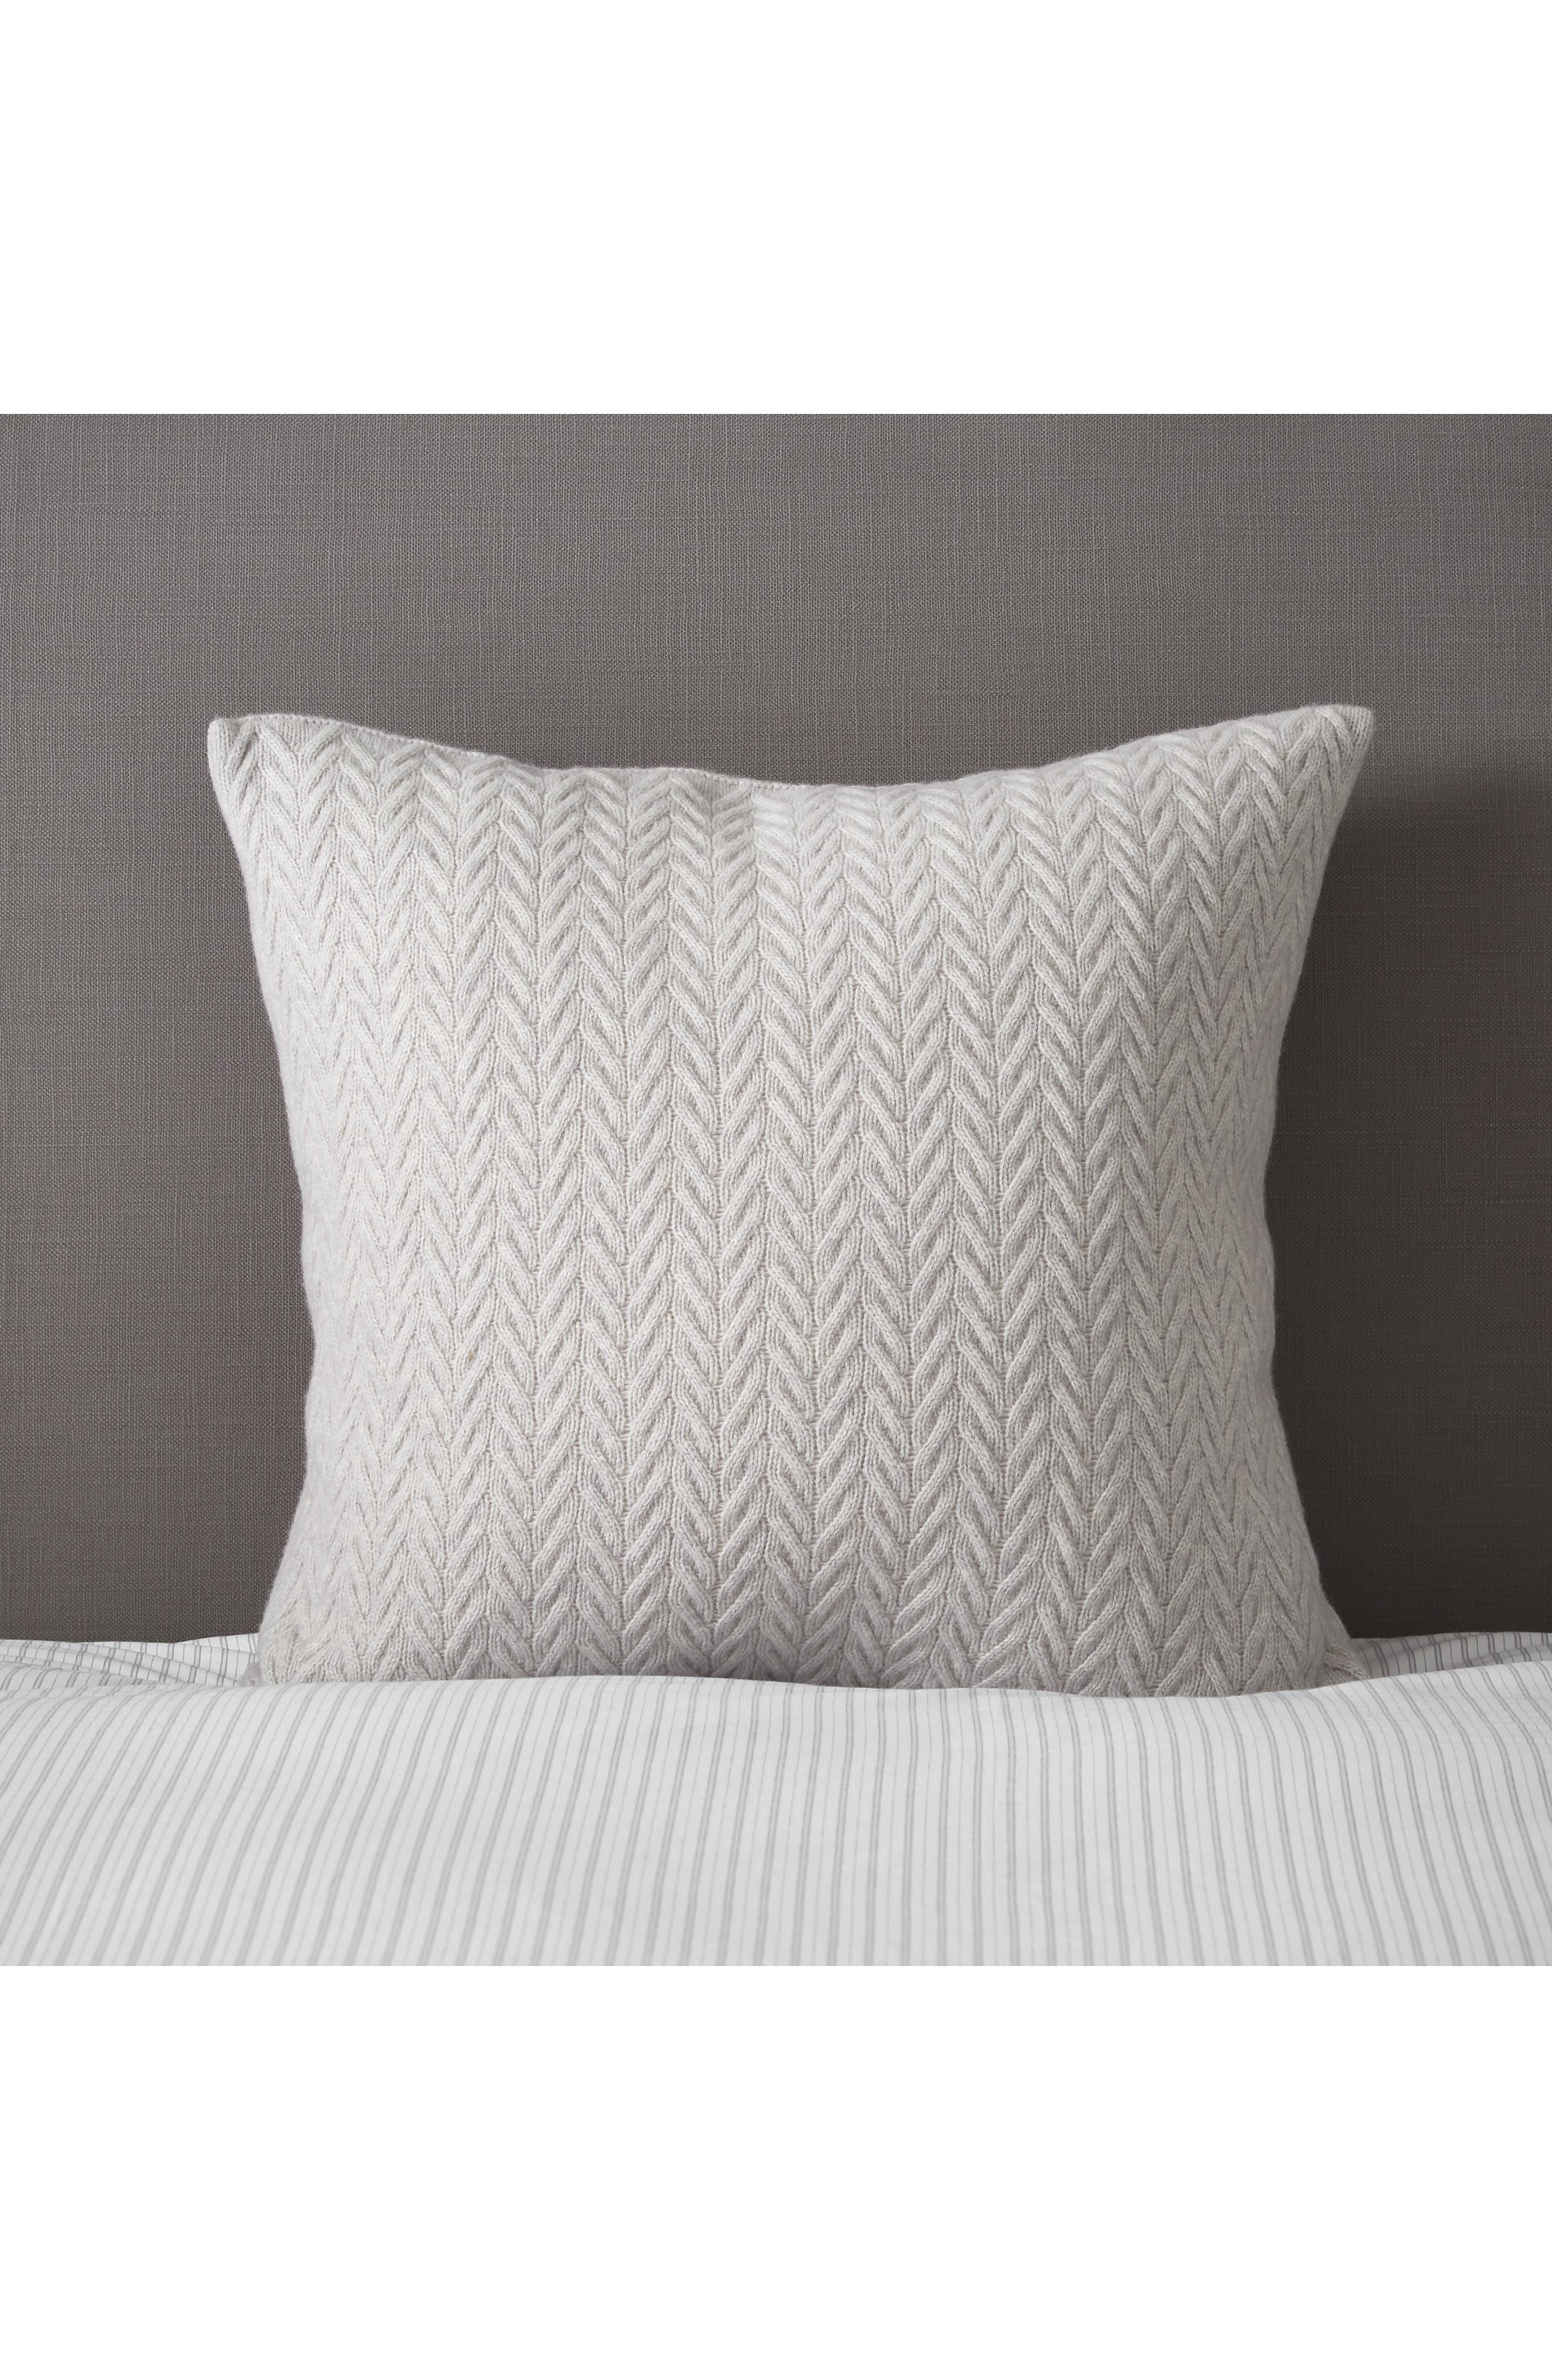 THE WHITE COMPANY Fairfax Cushion Cover, Main, color, 020